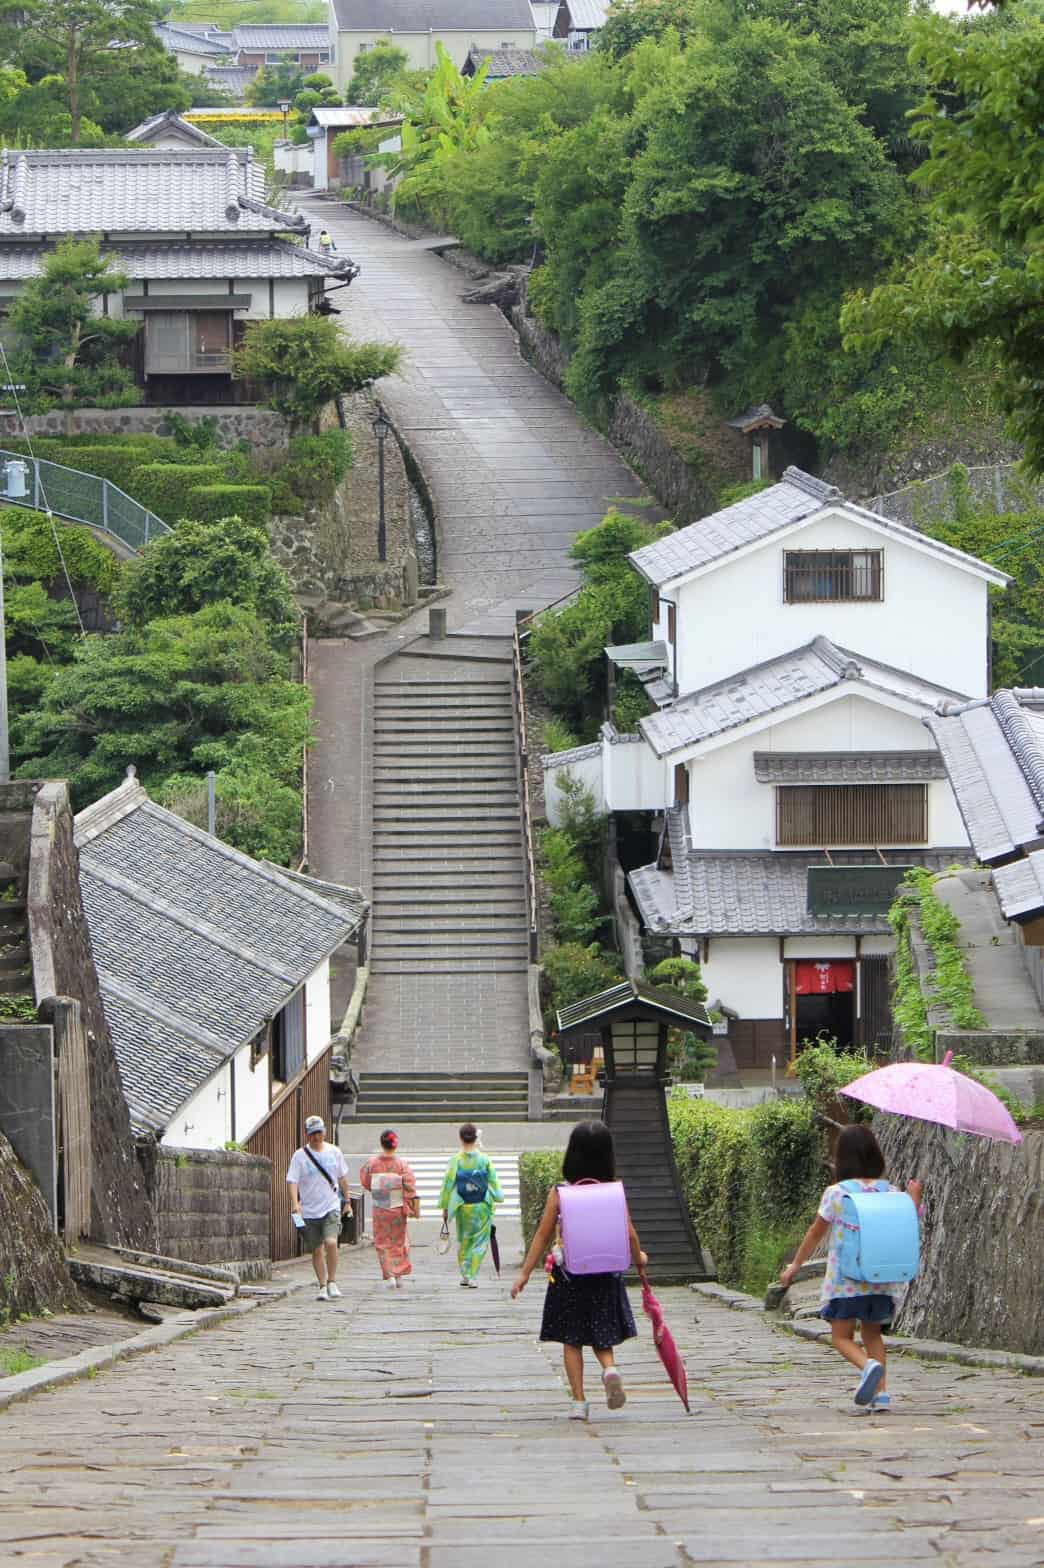 Kitsuki หมู่บ้านโบราณญี่ปุ่น